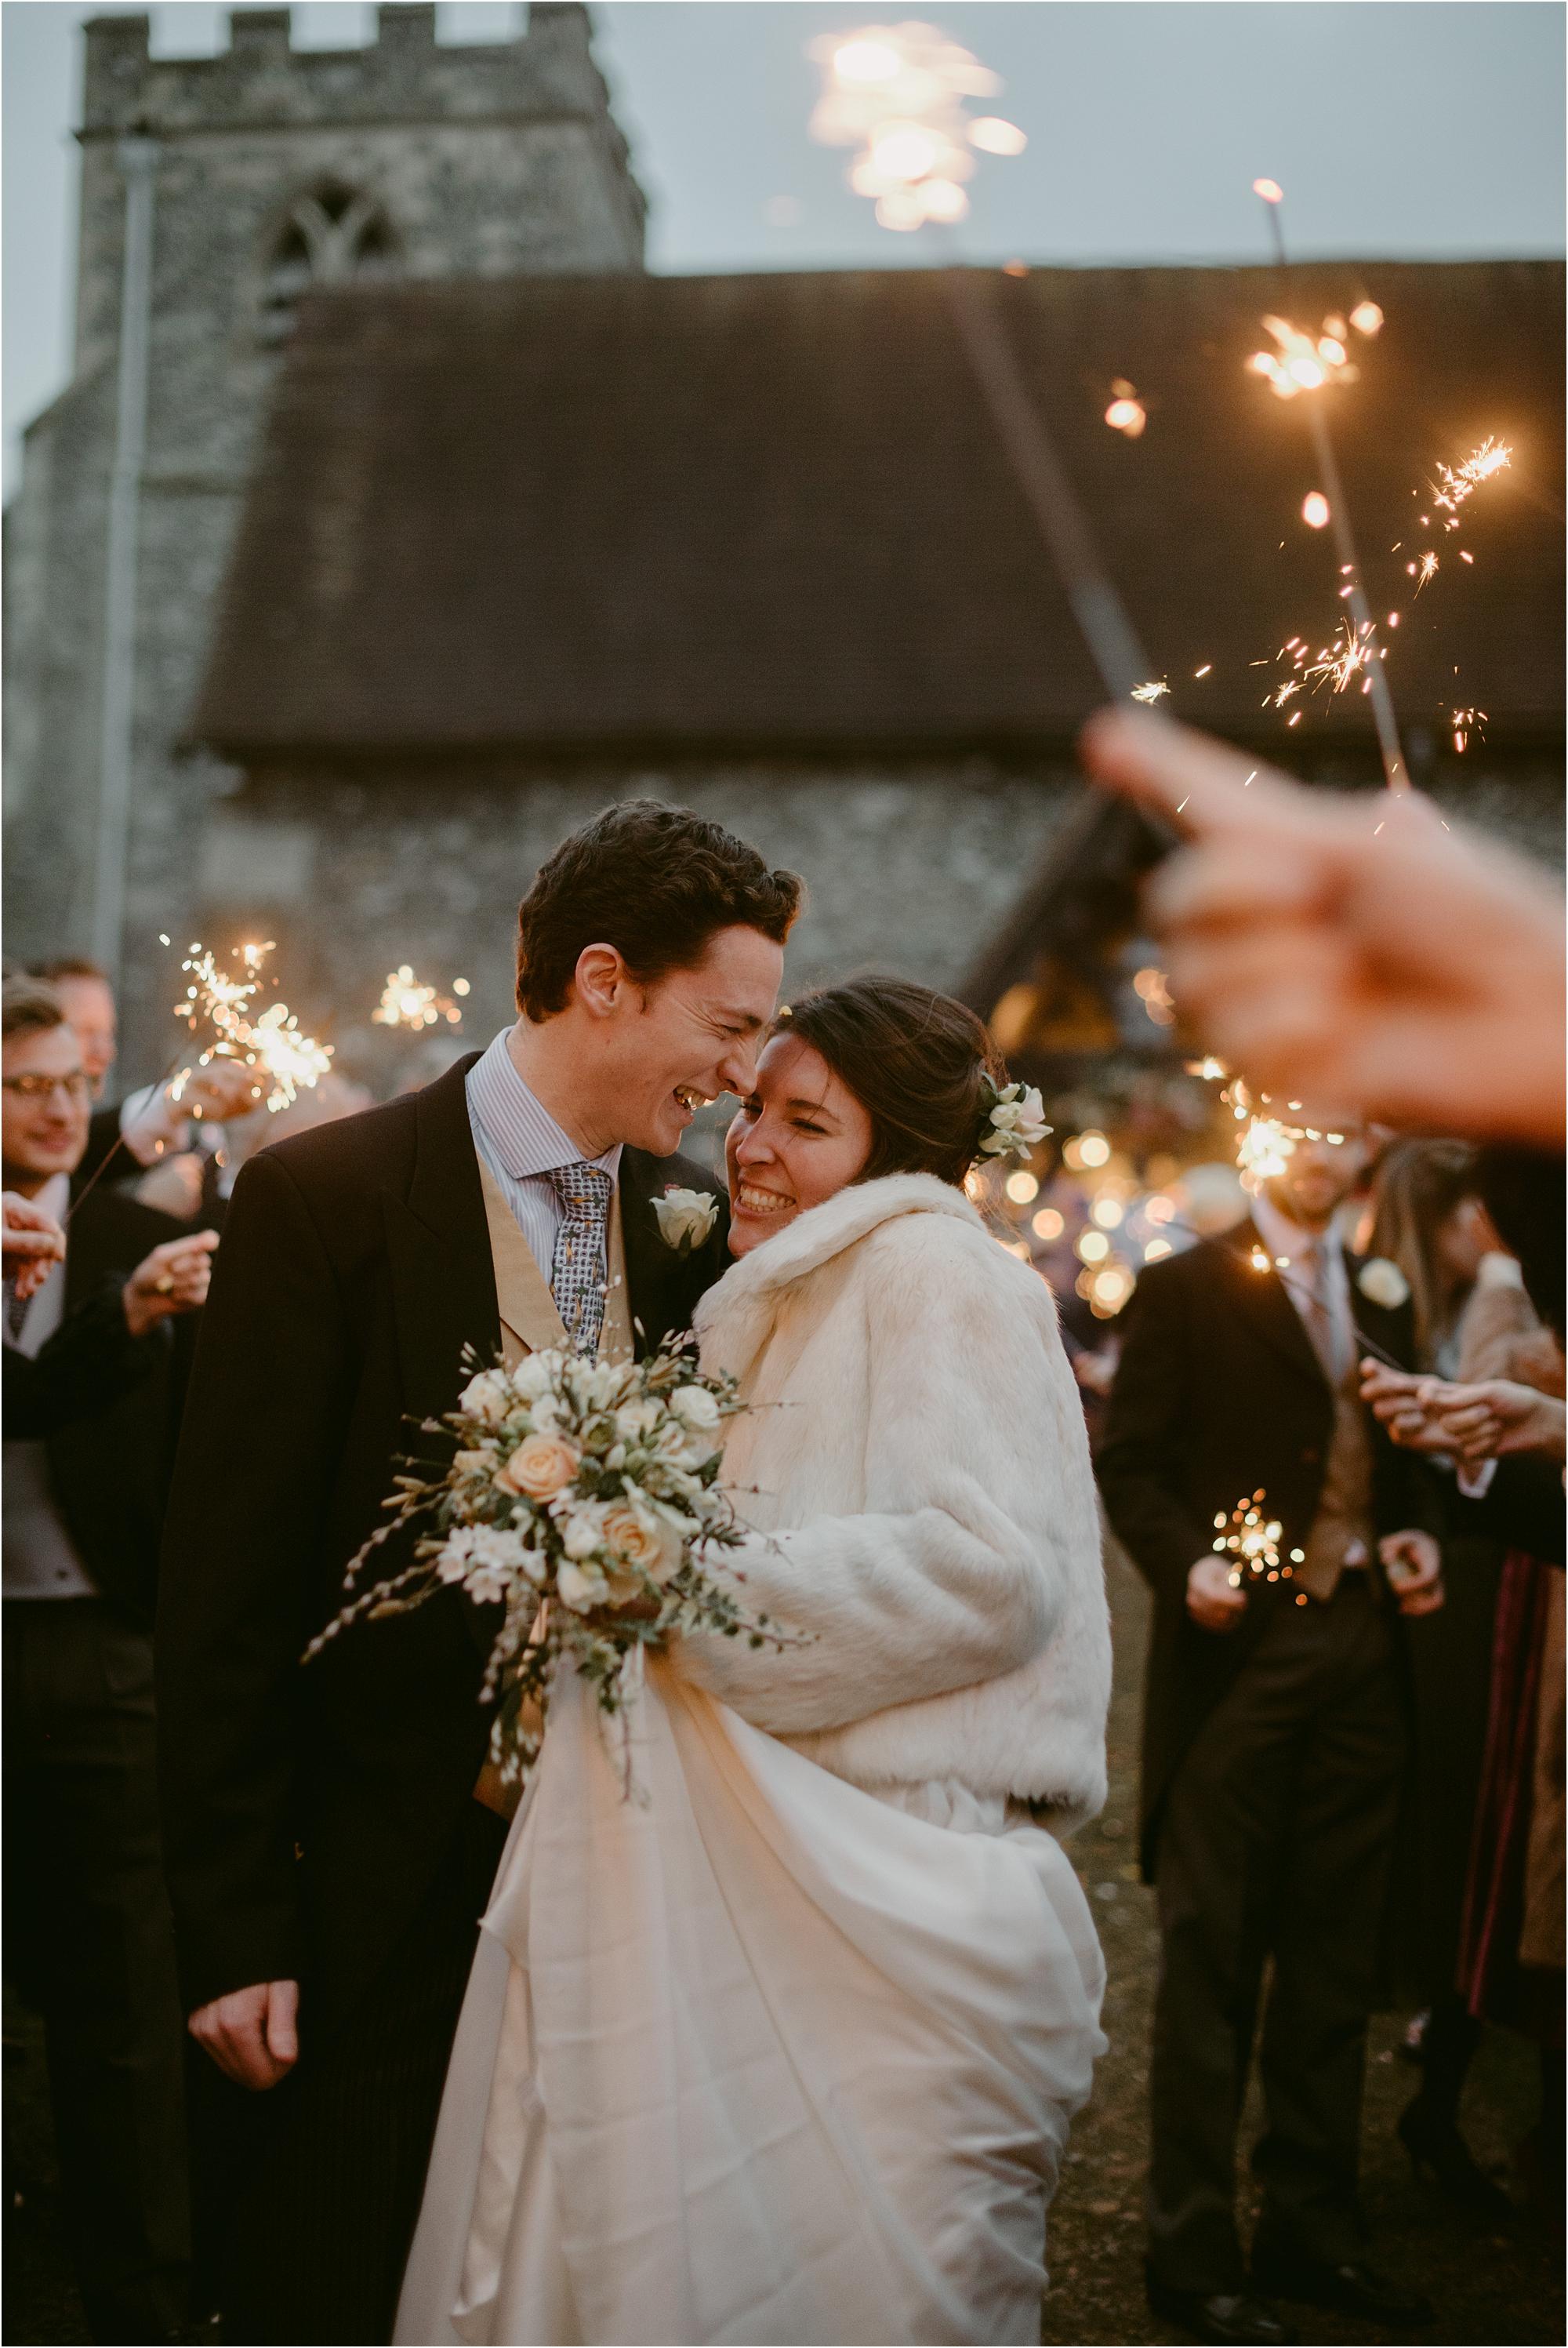 Rose+Harry-outdoor-english-wedding-photography__0086.jpg